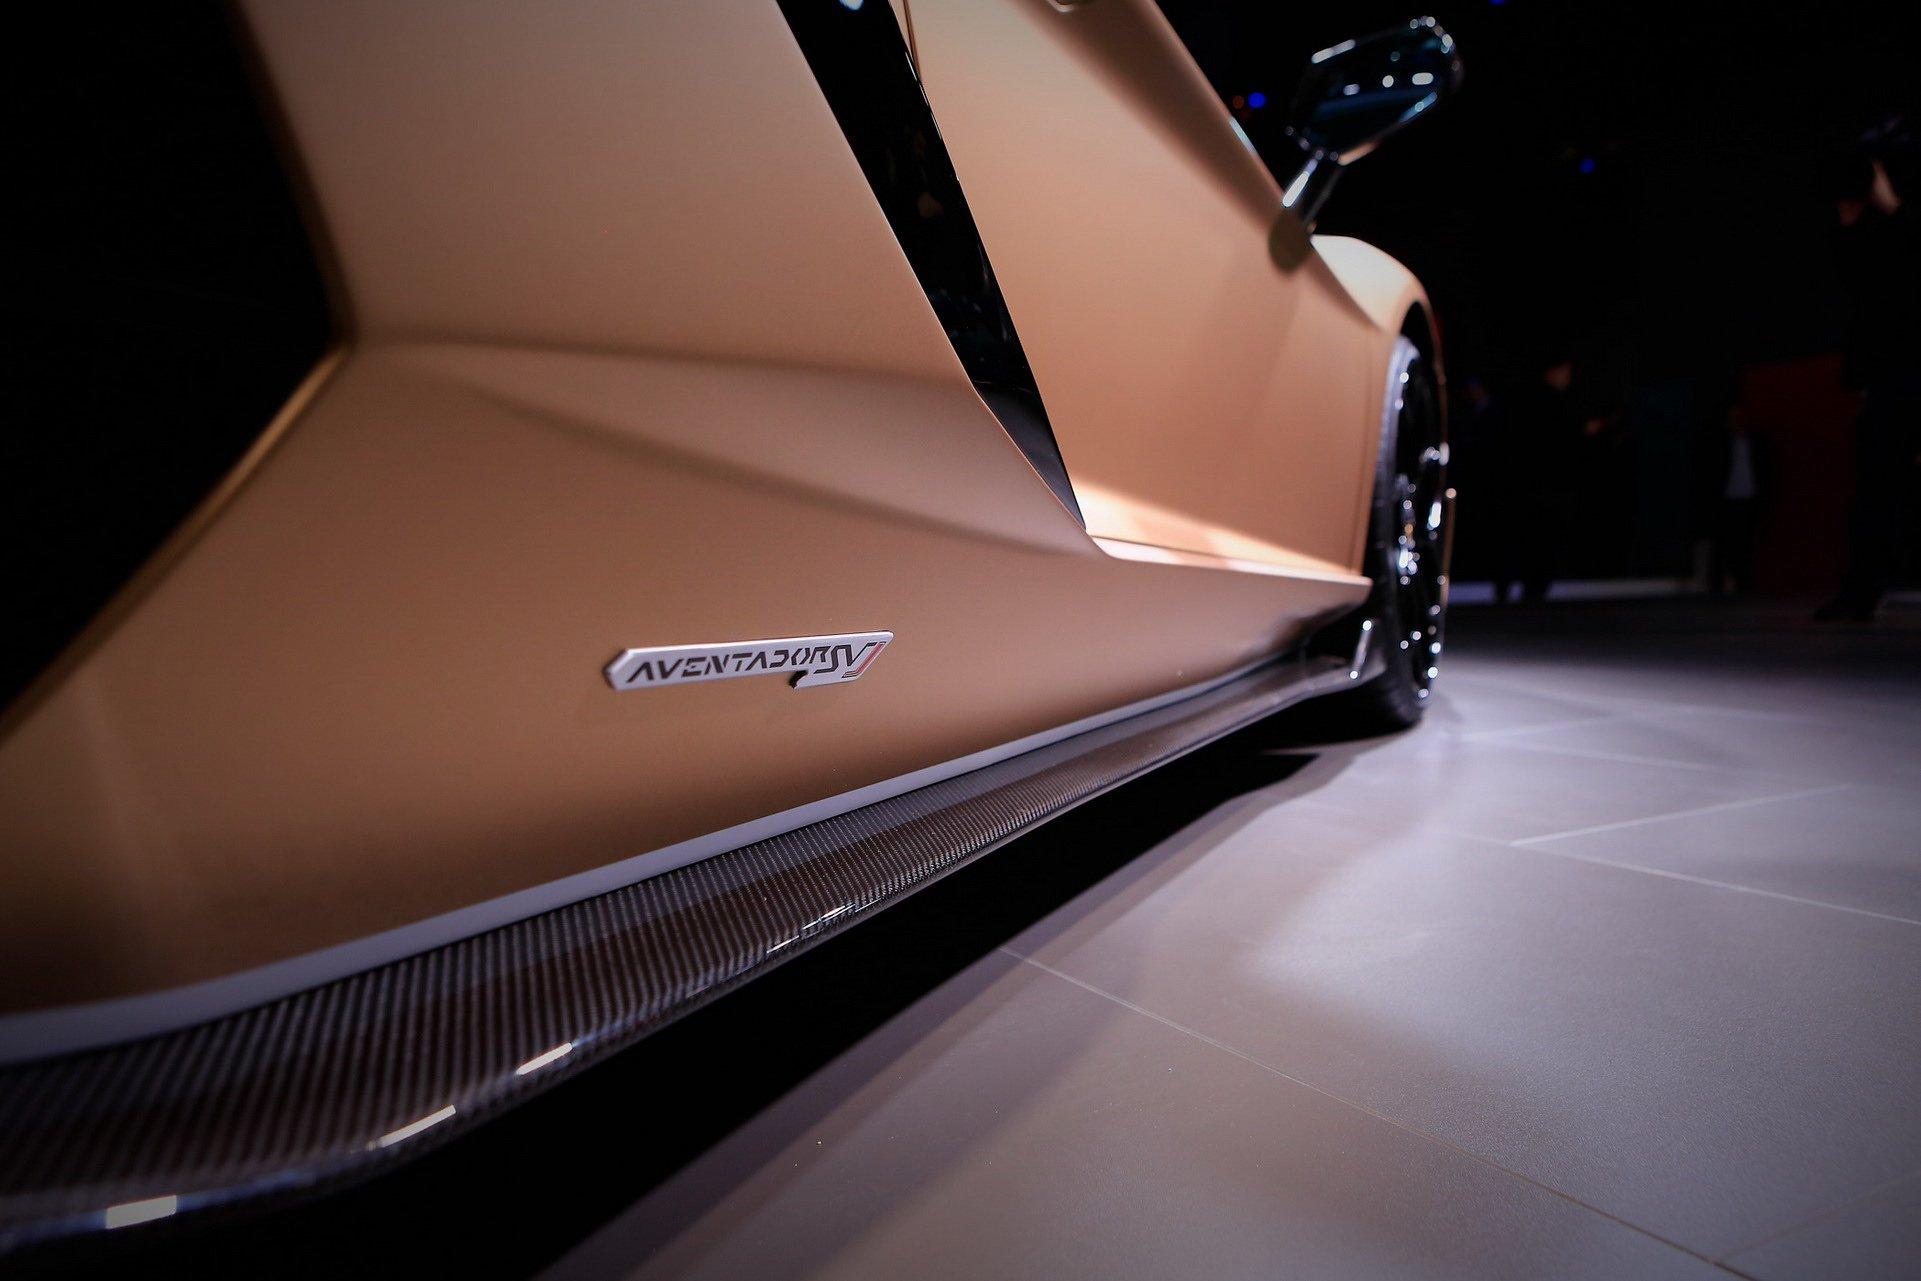 a02f6c57-lamborghini-aventador-svj-roadster-4.jpg